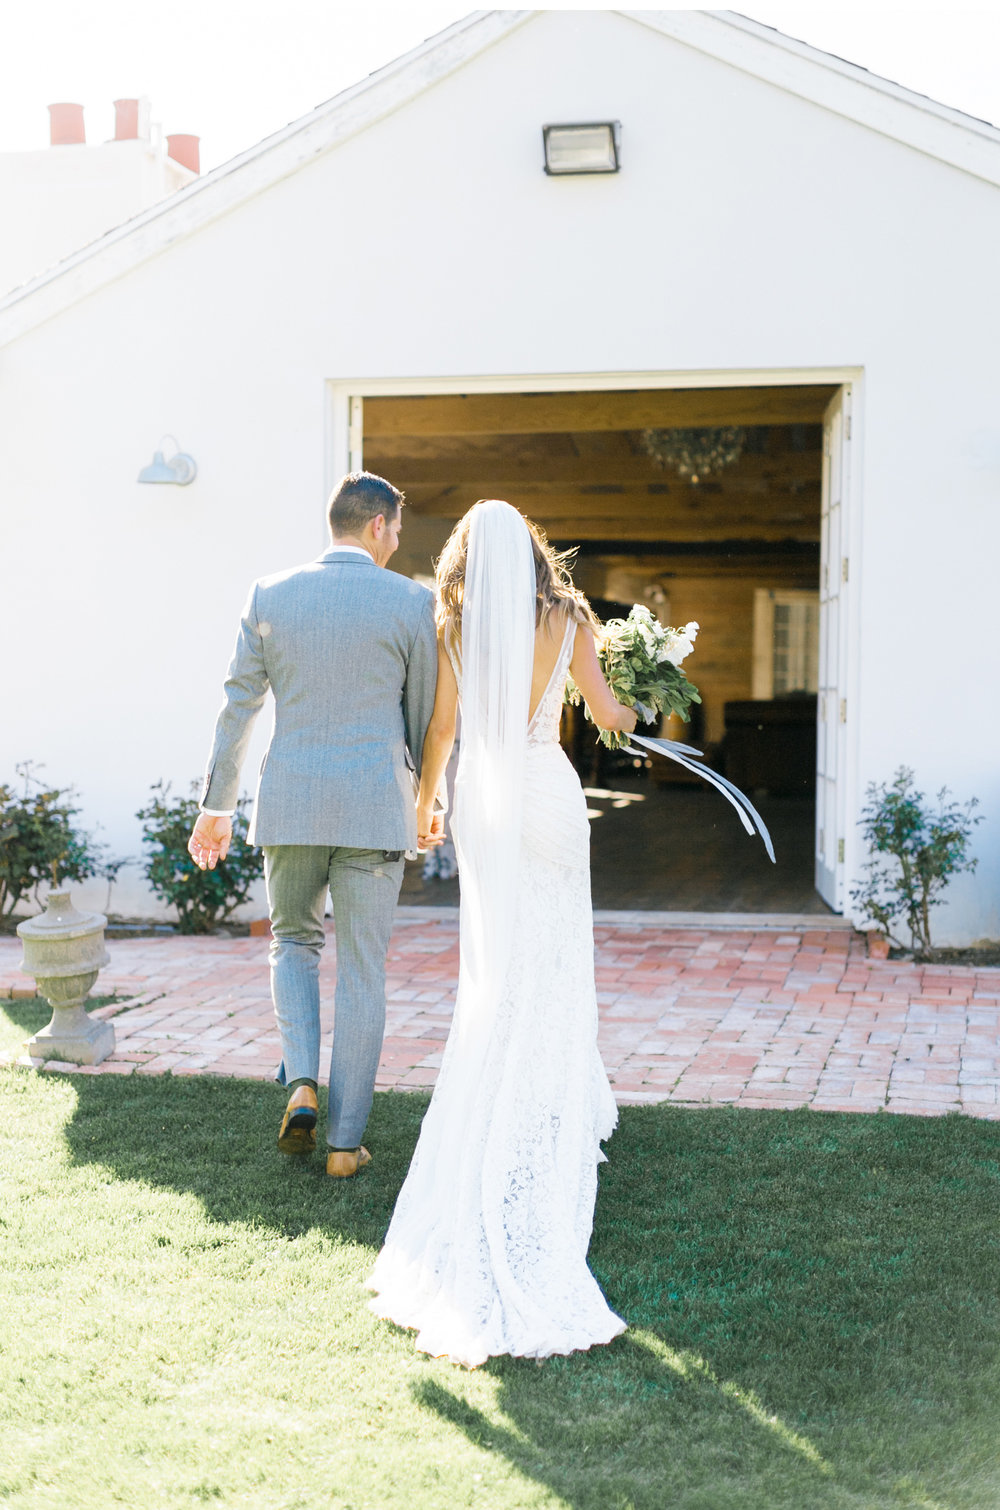 Malibu-Wedding-Photographer-Triunfo-Creek-Natalie-Schutt-Photography_07.jpg